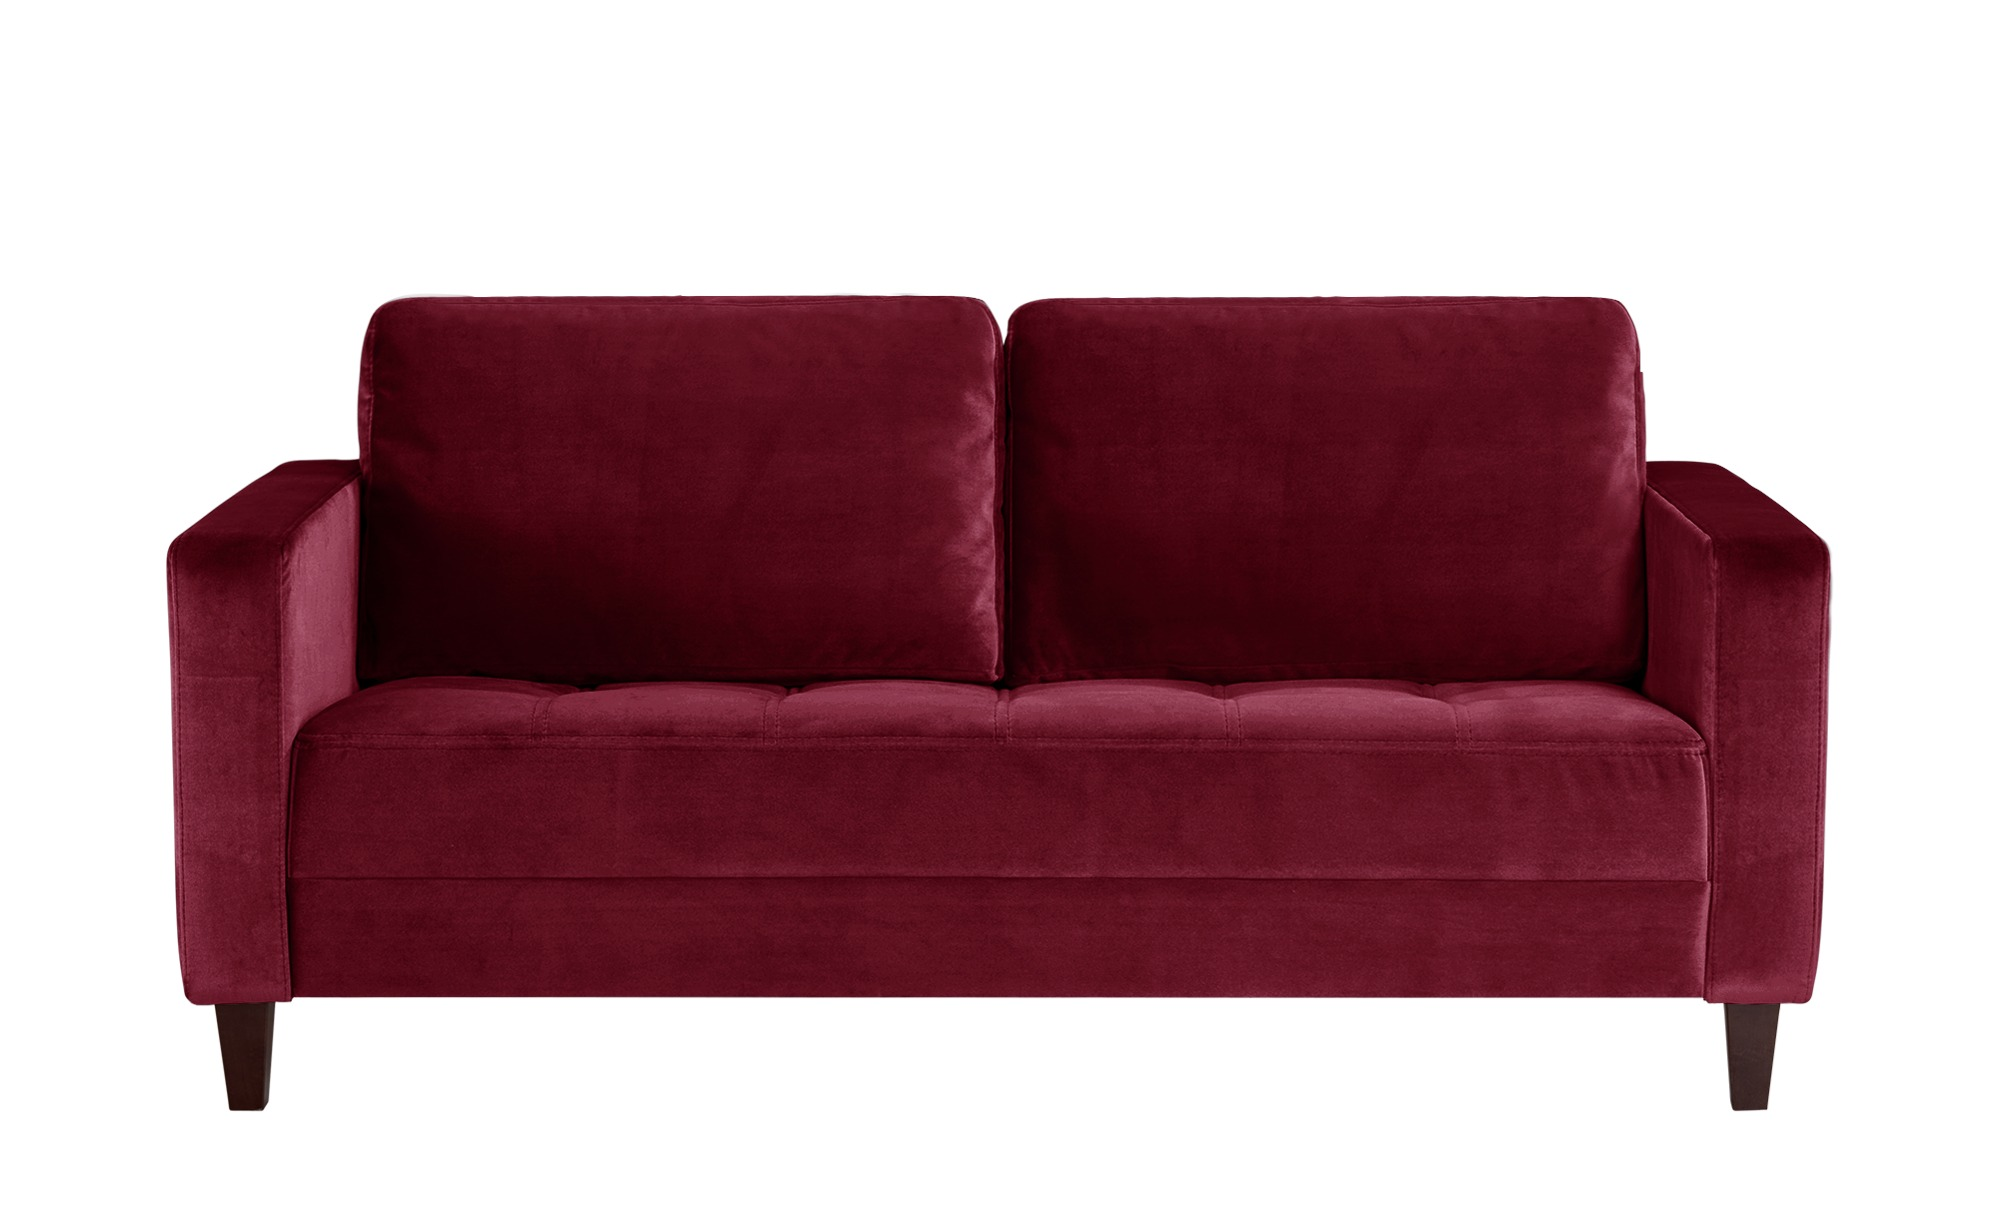 smart Sofa rot - Mikrofaser Geradine ¦ rot ¦ Maße (cm): B: 178 H: 83 T: 91 Polstermöbel > Sofas > 2-Sitzer - Höffner